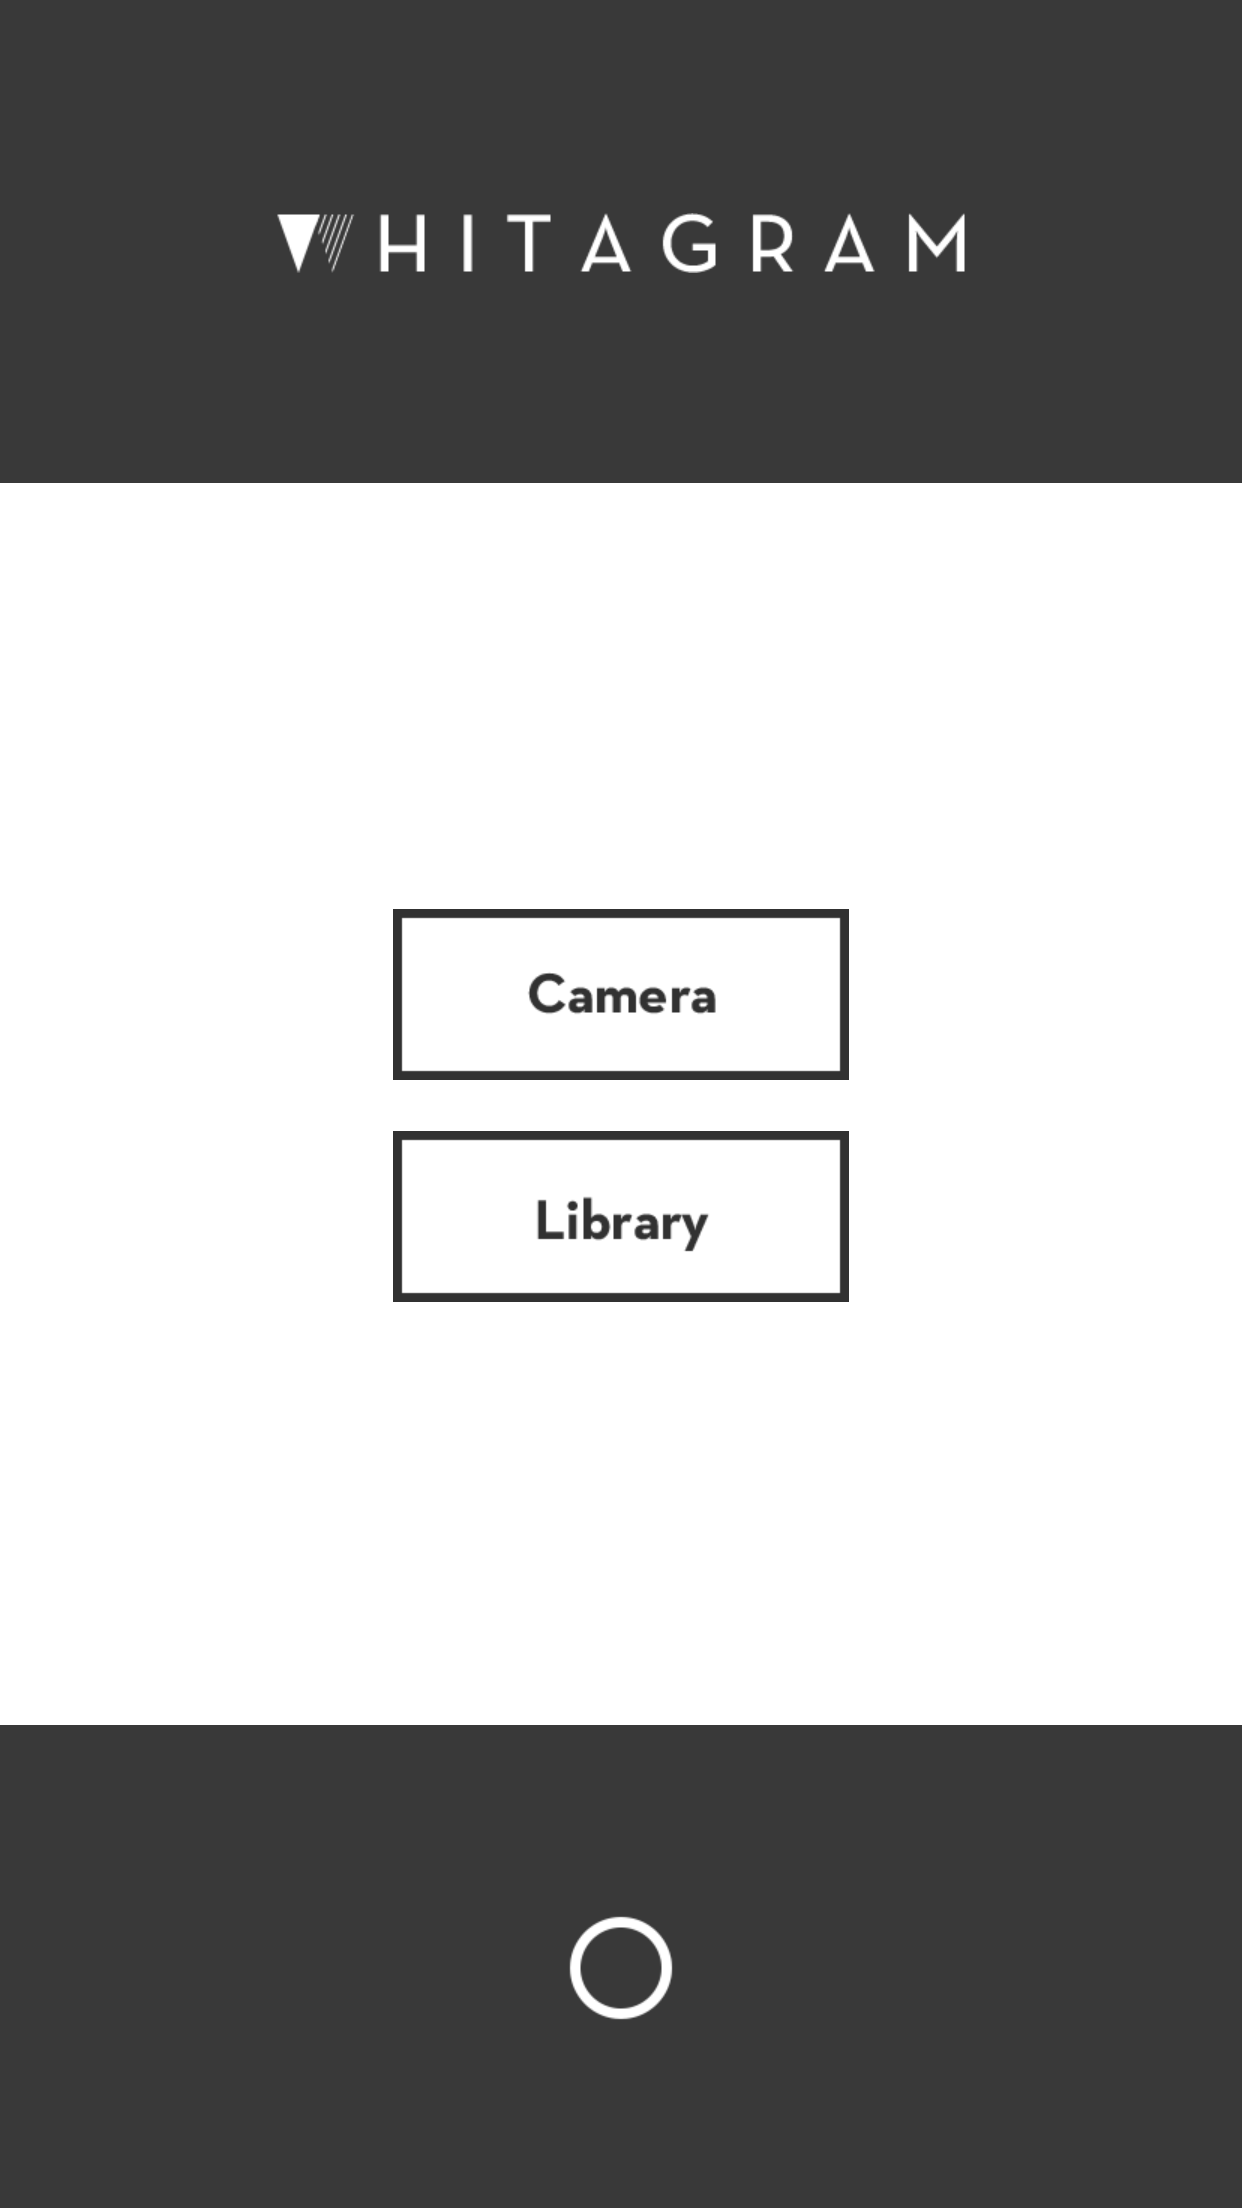 Whitagram Screenshot